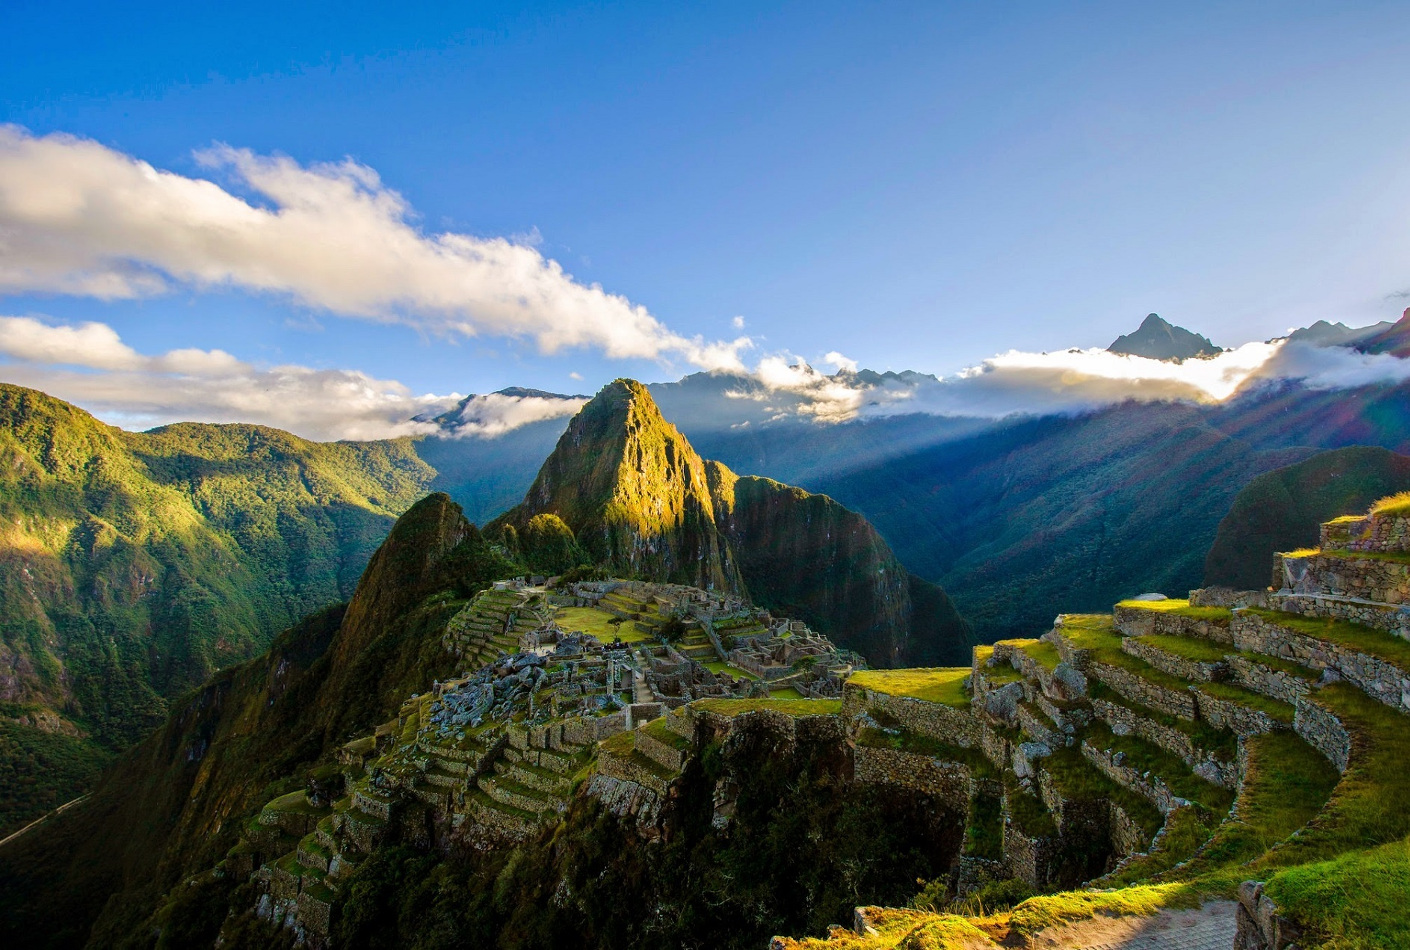 Vista aérea de Machu Picchu, Perú. Viaje a Peru exclusivo.